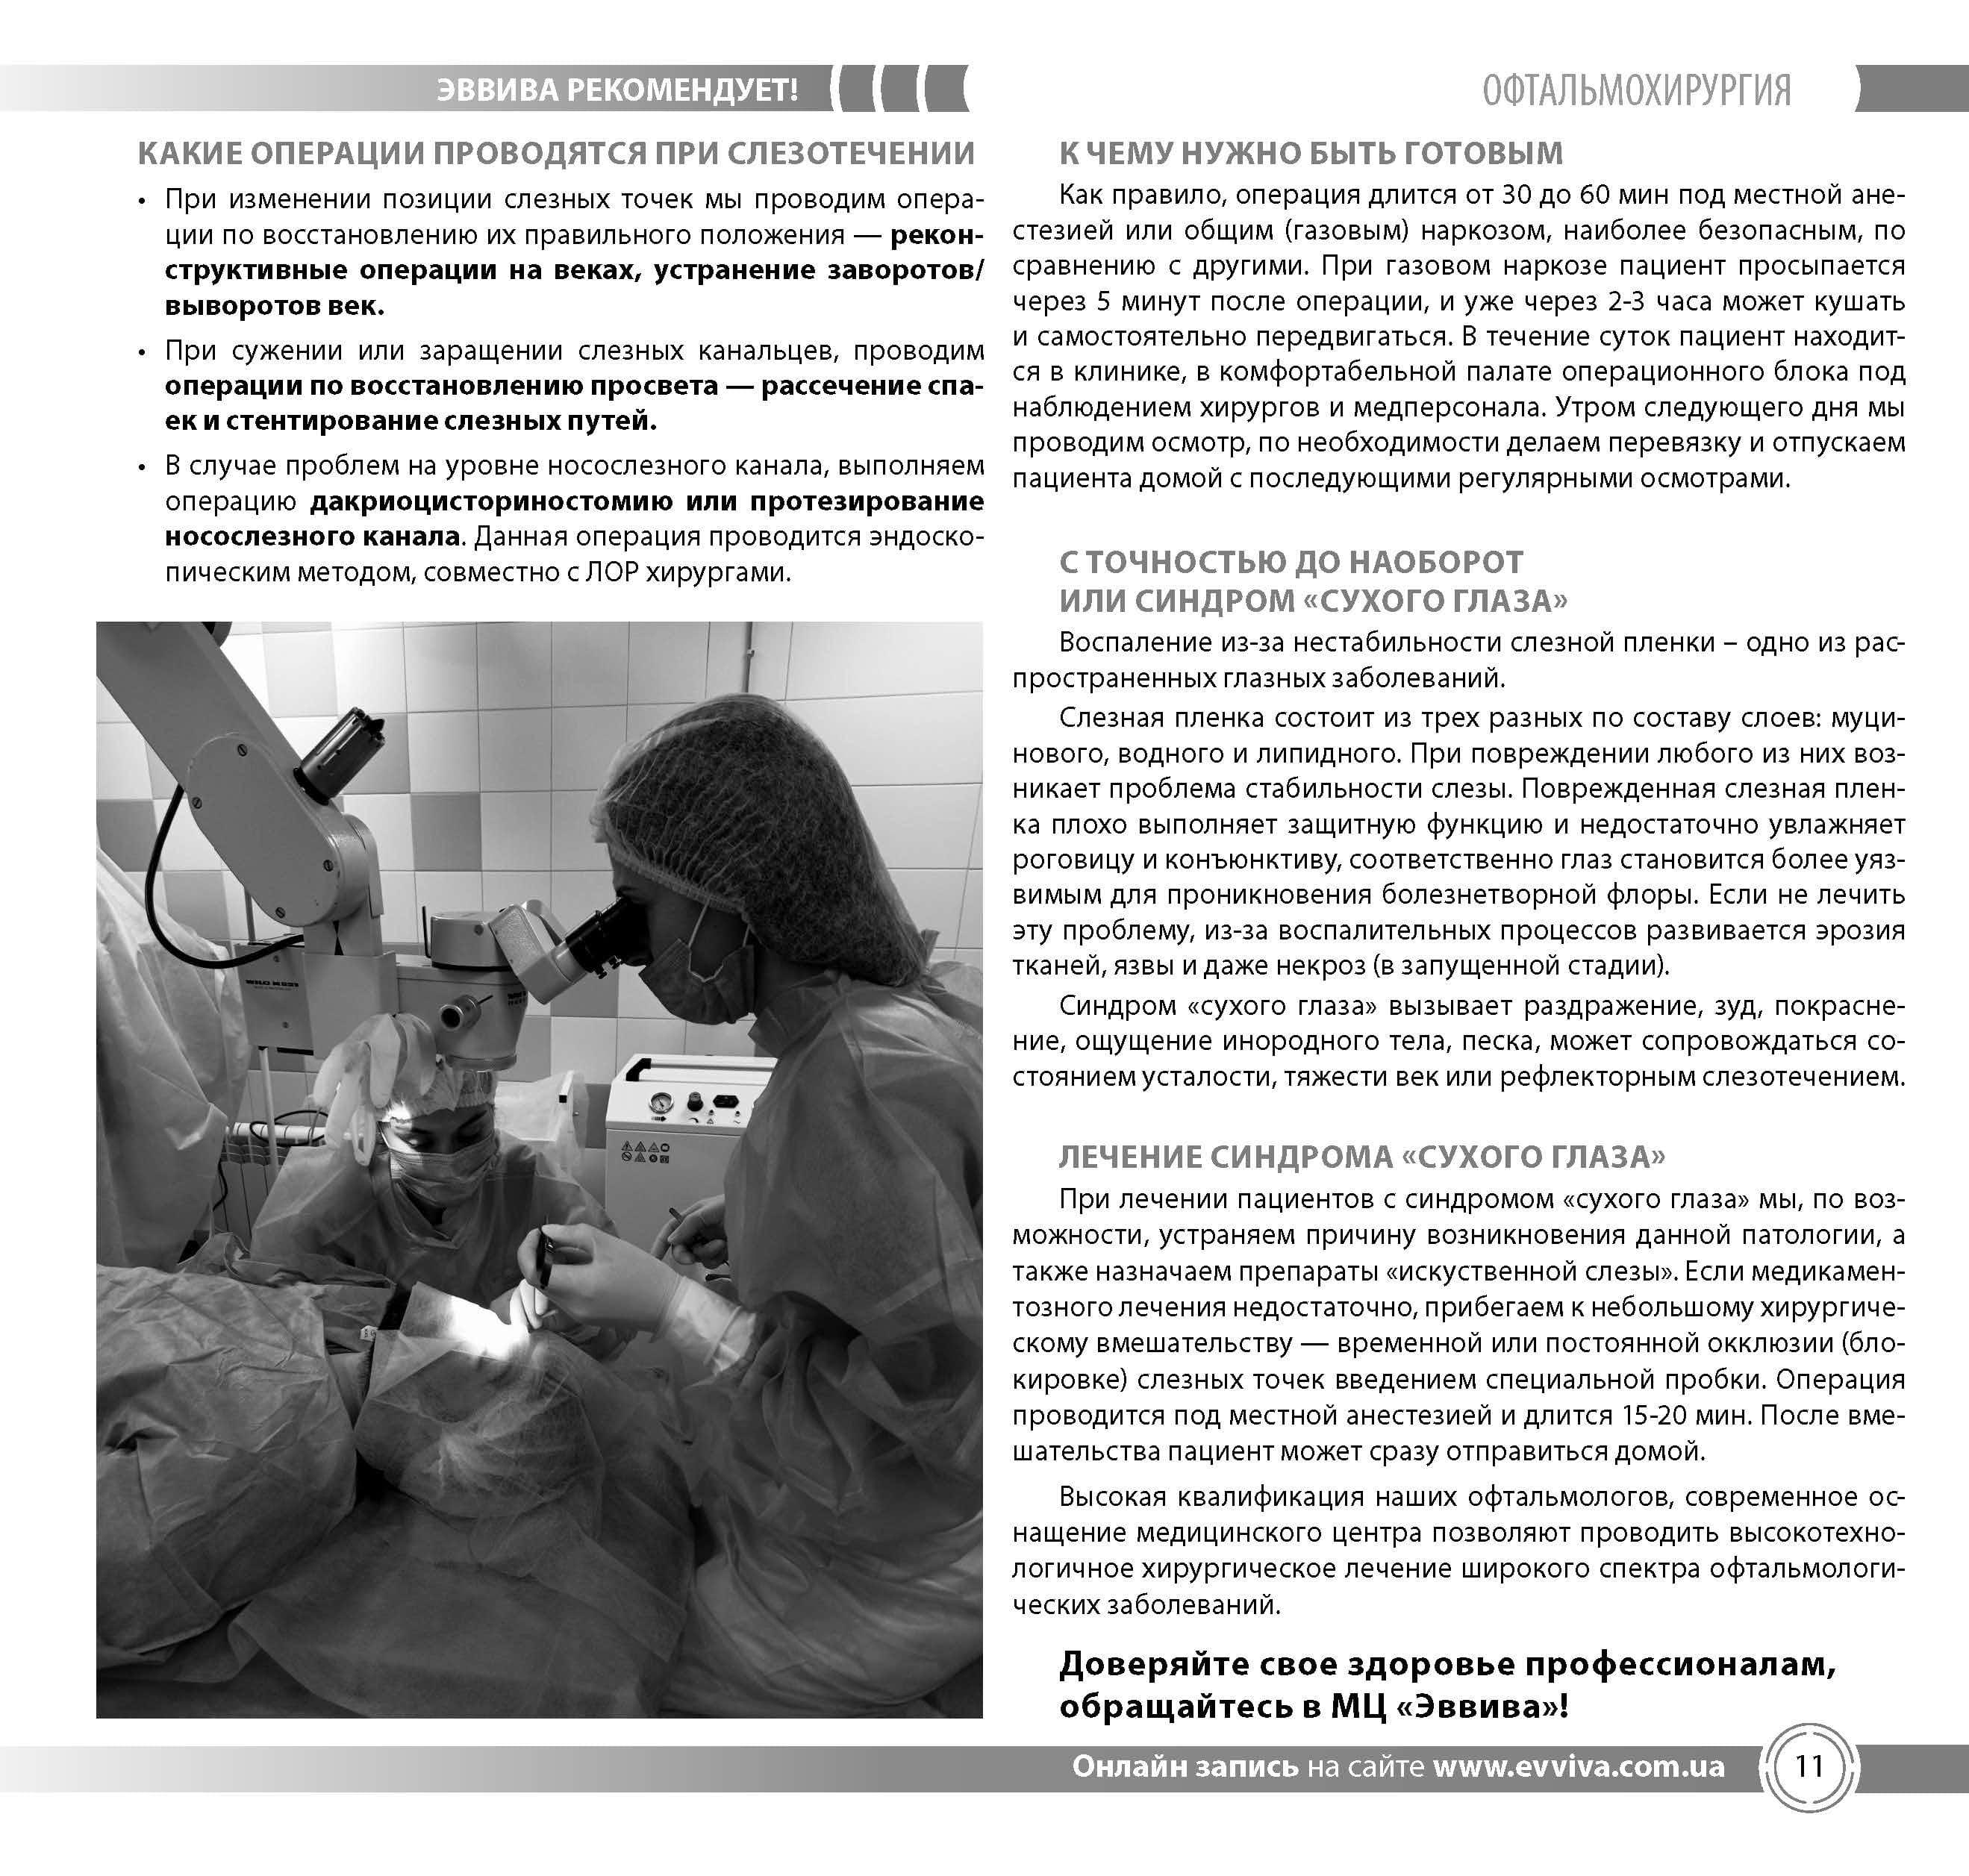 evviva-zhurnal-119-page11